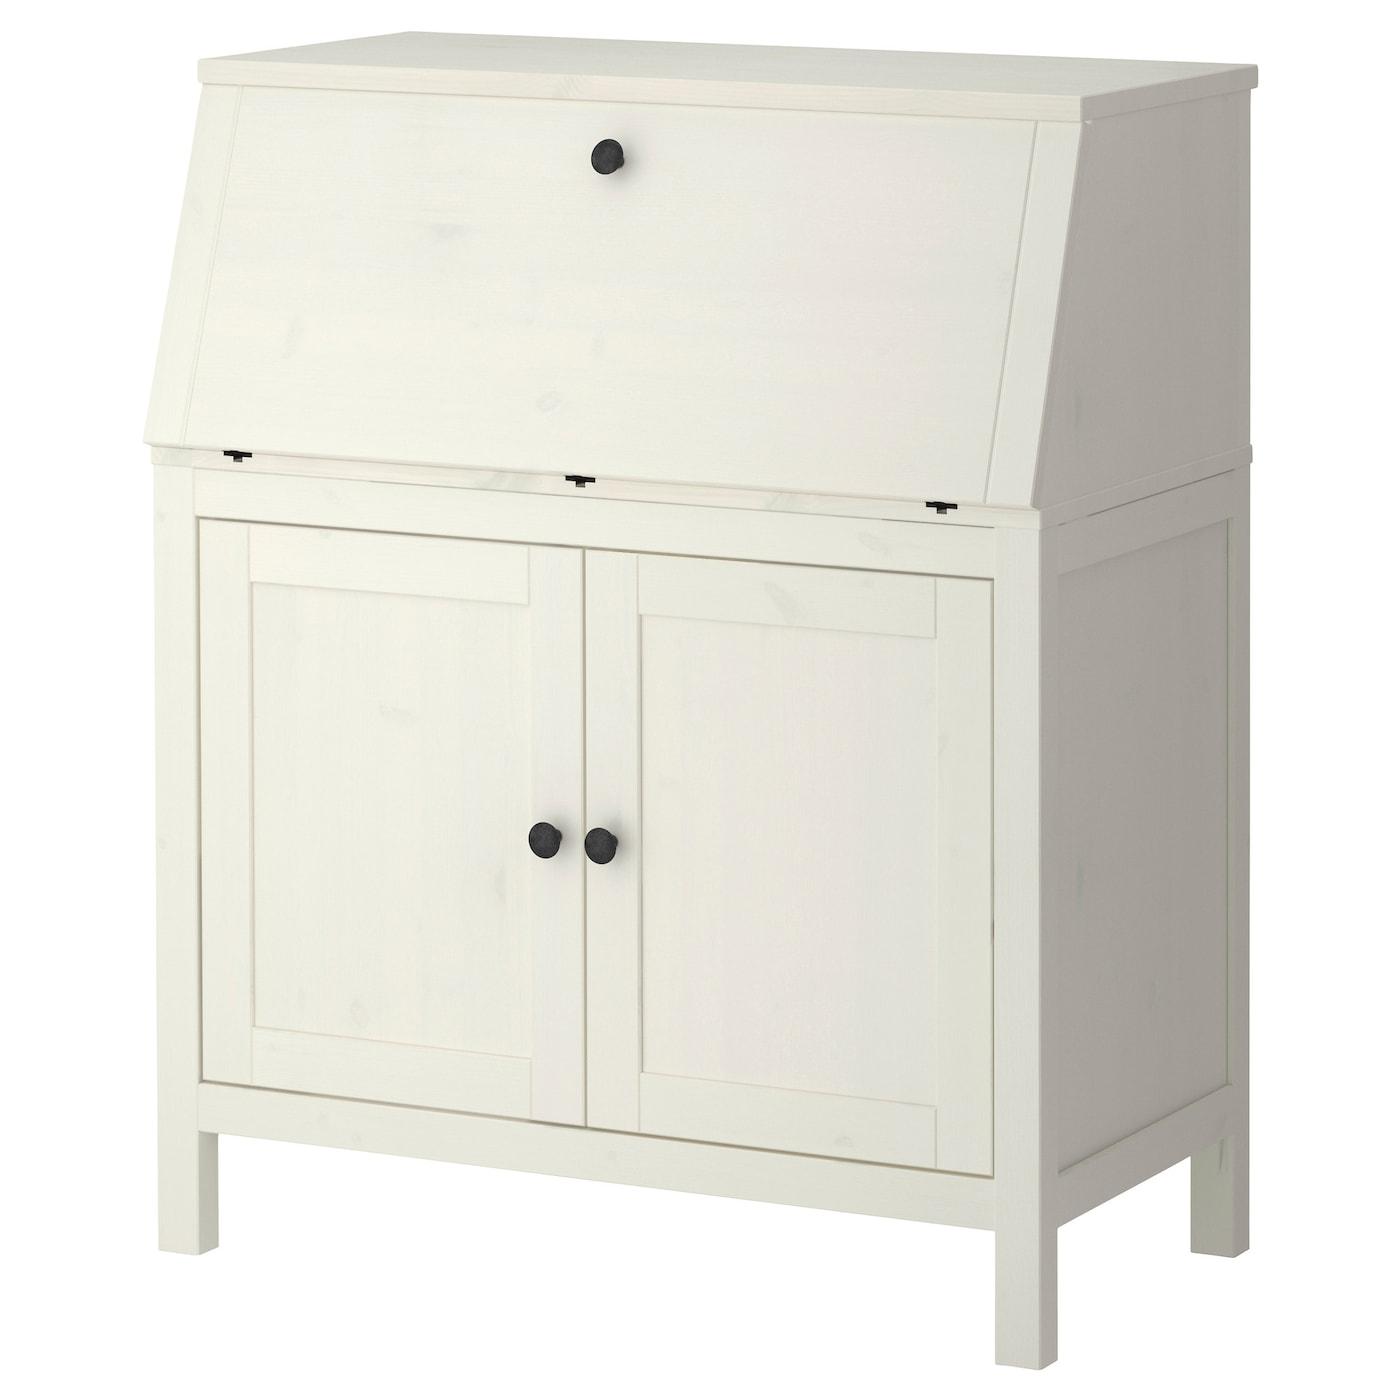 Hemnes bureau white stain 89 x 108 cm ikea for Mobile computer ikea